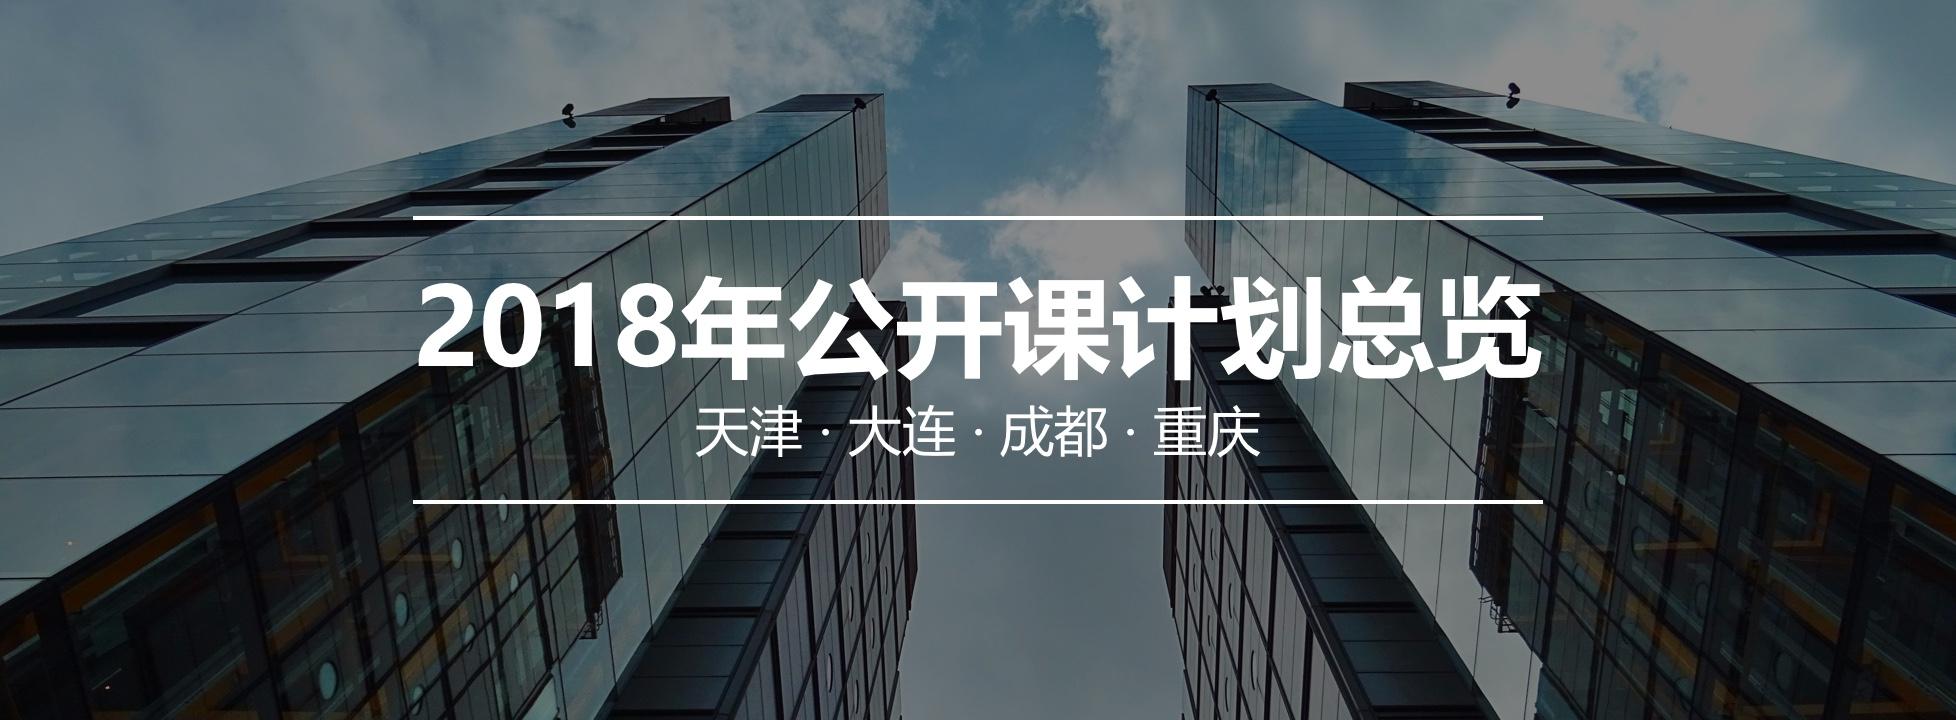 banner2018b